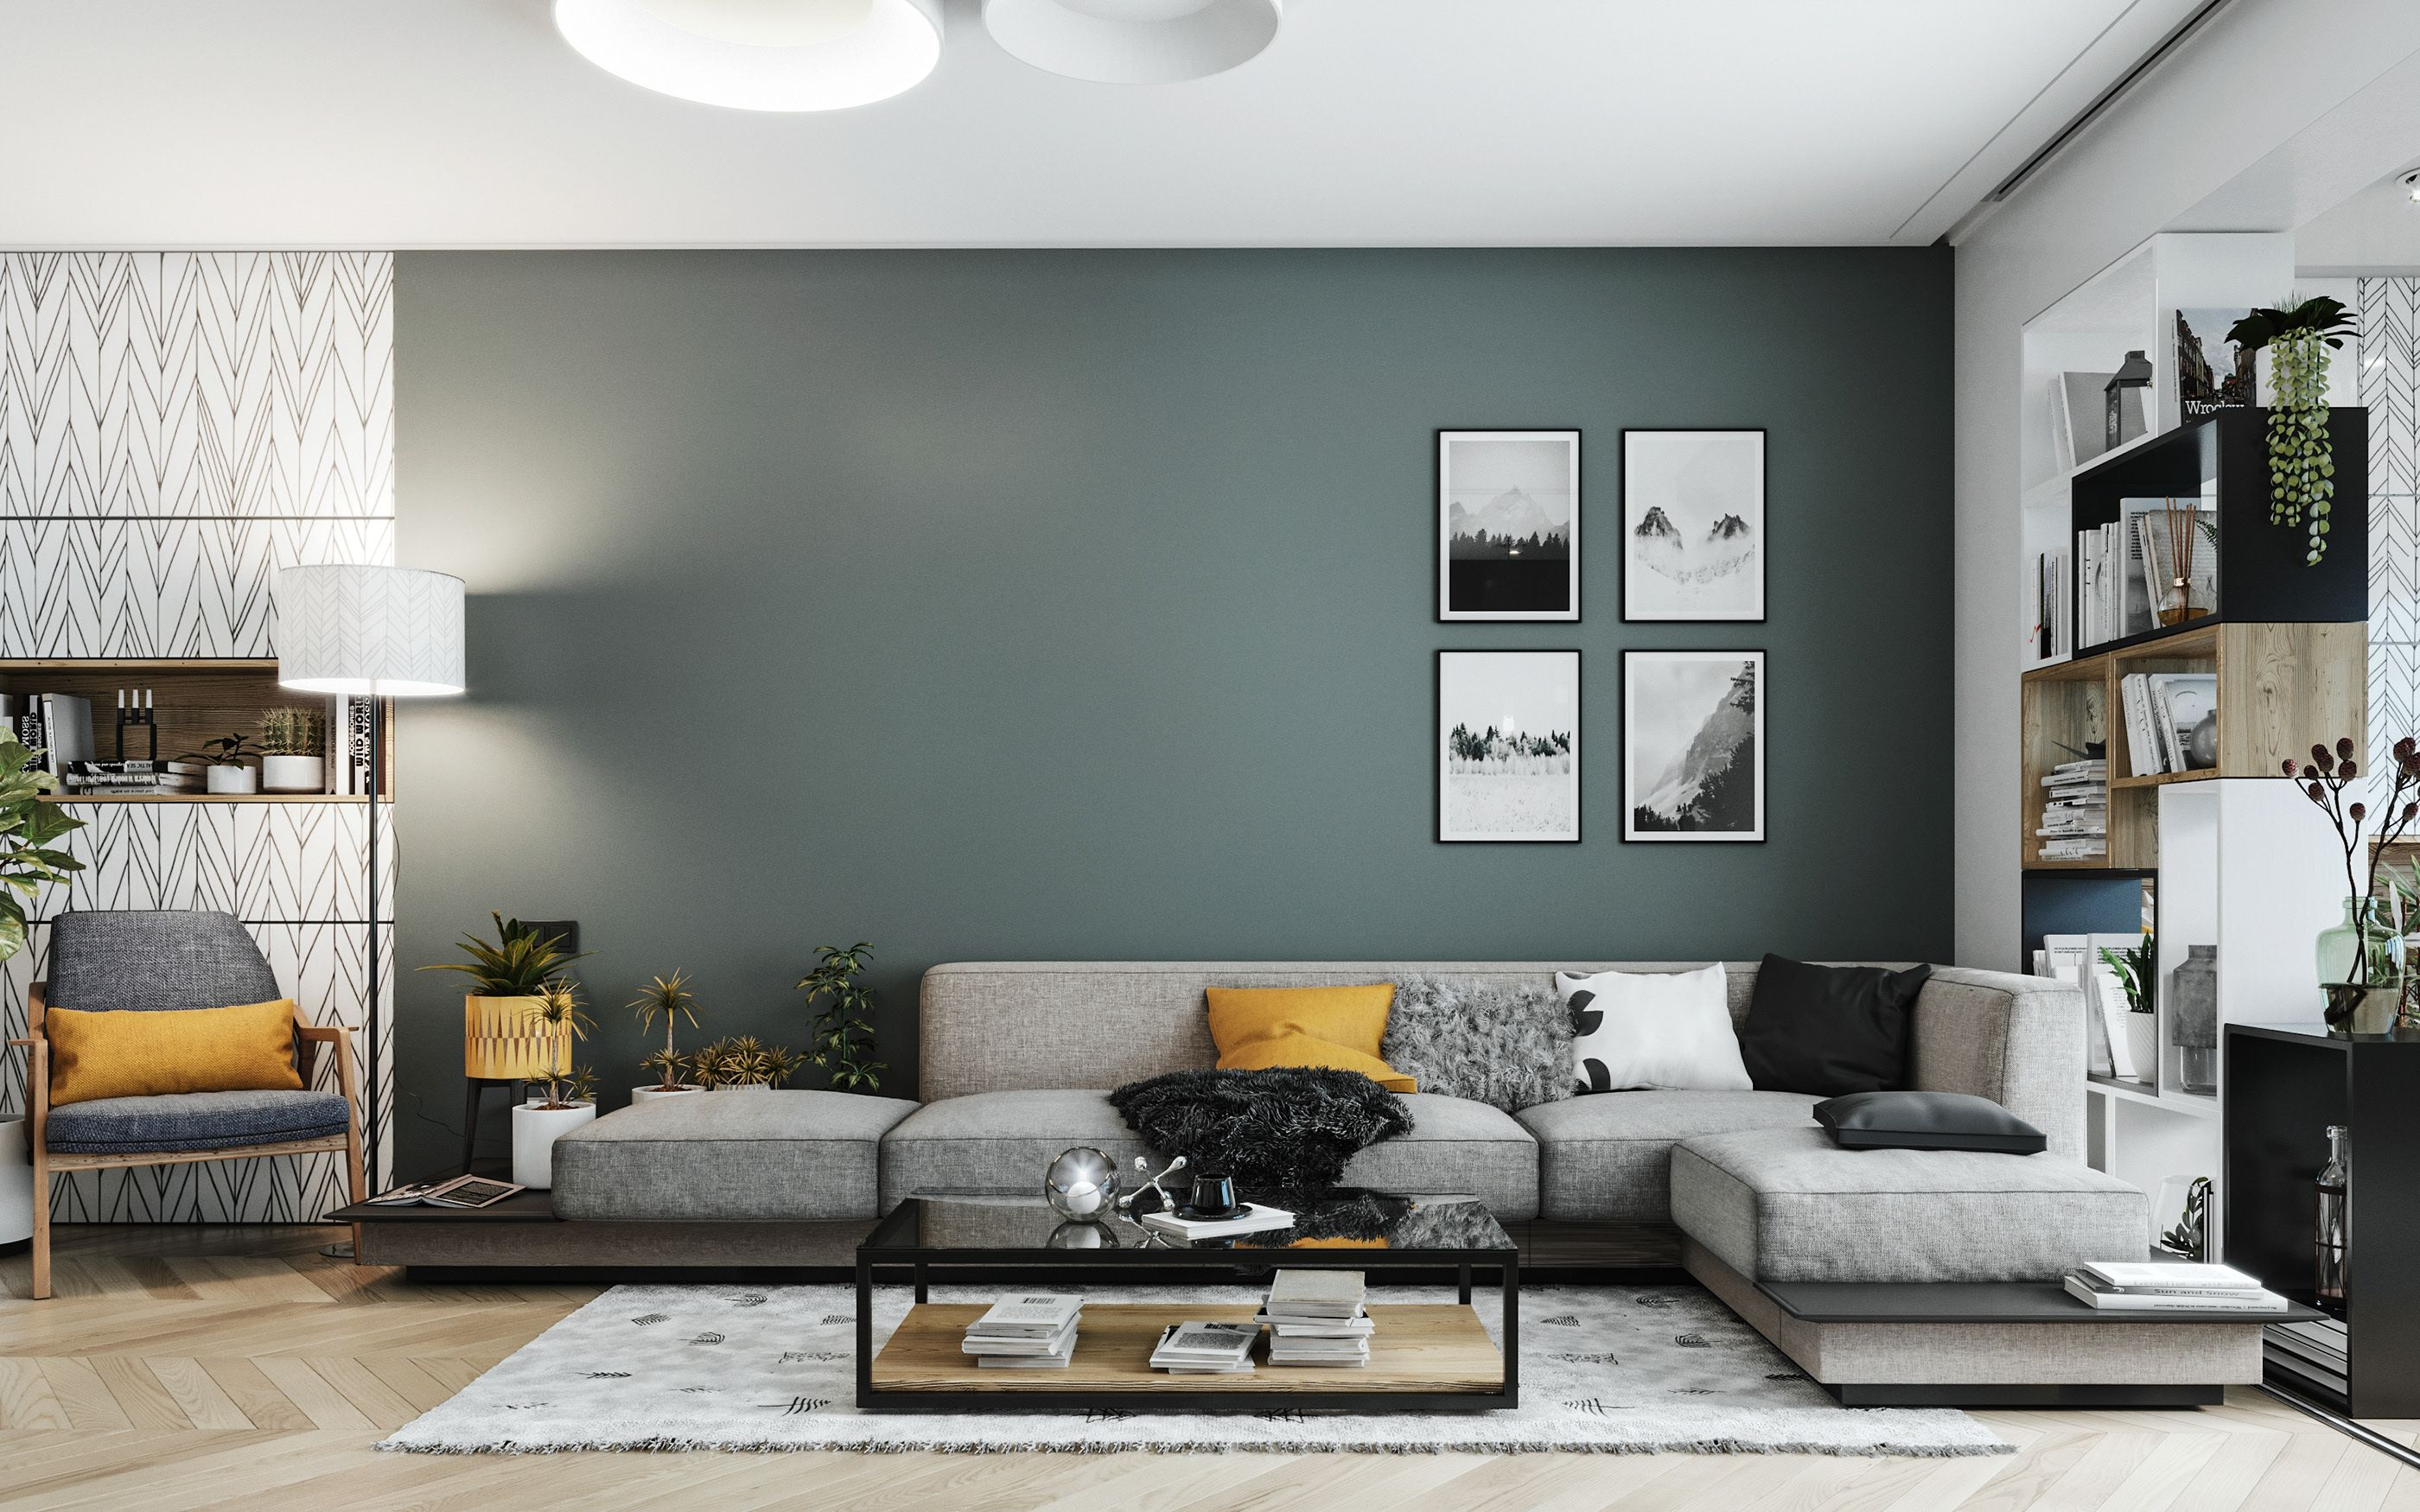 Scandinavian Apartment On Behance In 2020 Scandinavian Style Interior Scandinavian Style Home Scandinavian Interior Design